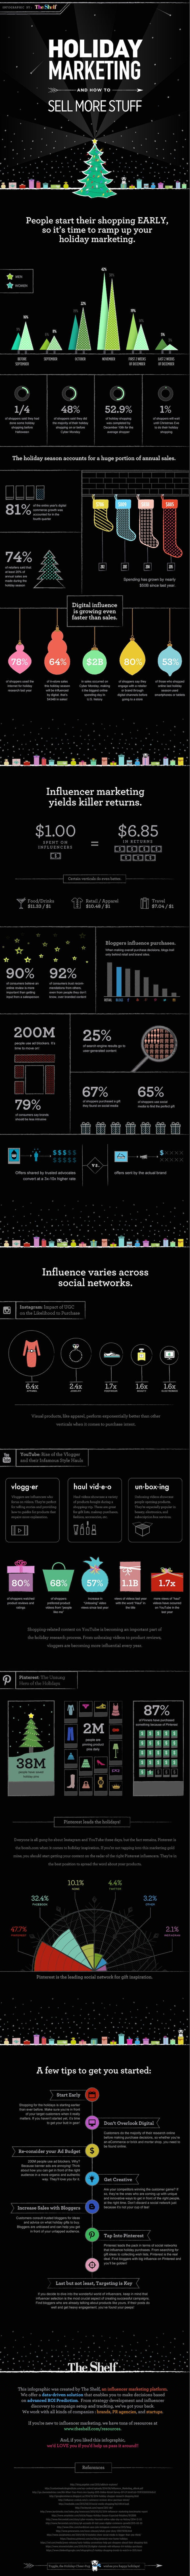 holiday-marketing-sales-ecommerce-2015-infographic-669